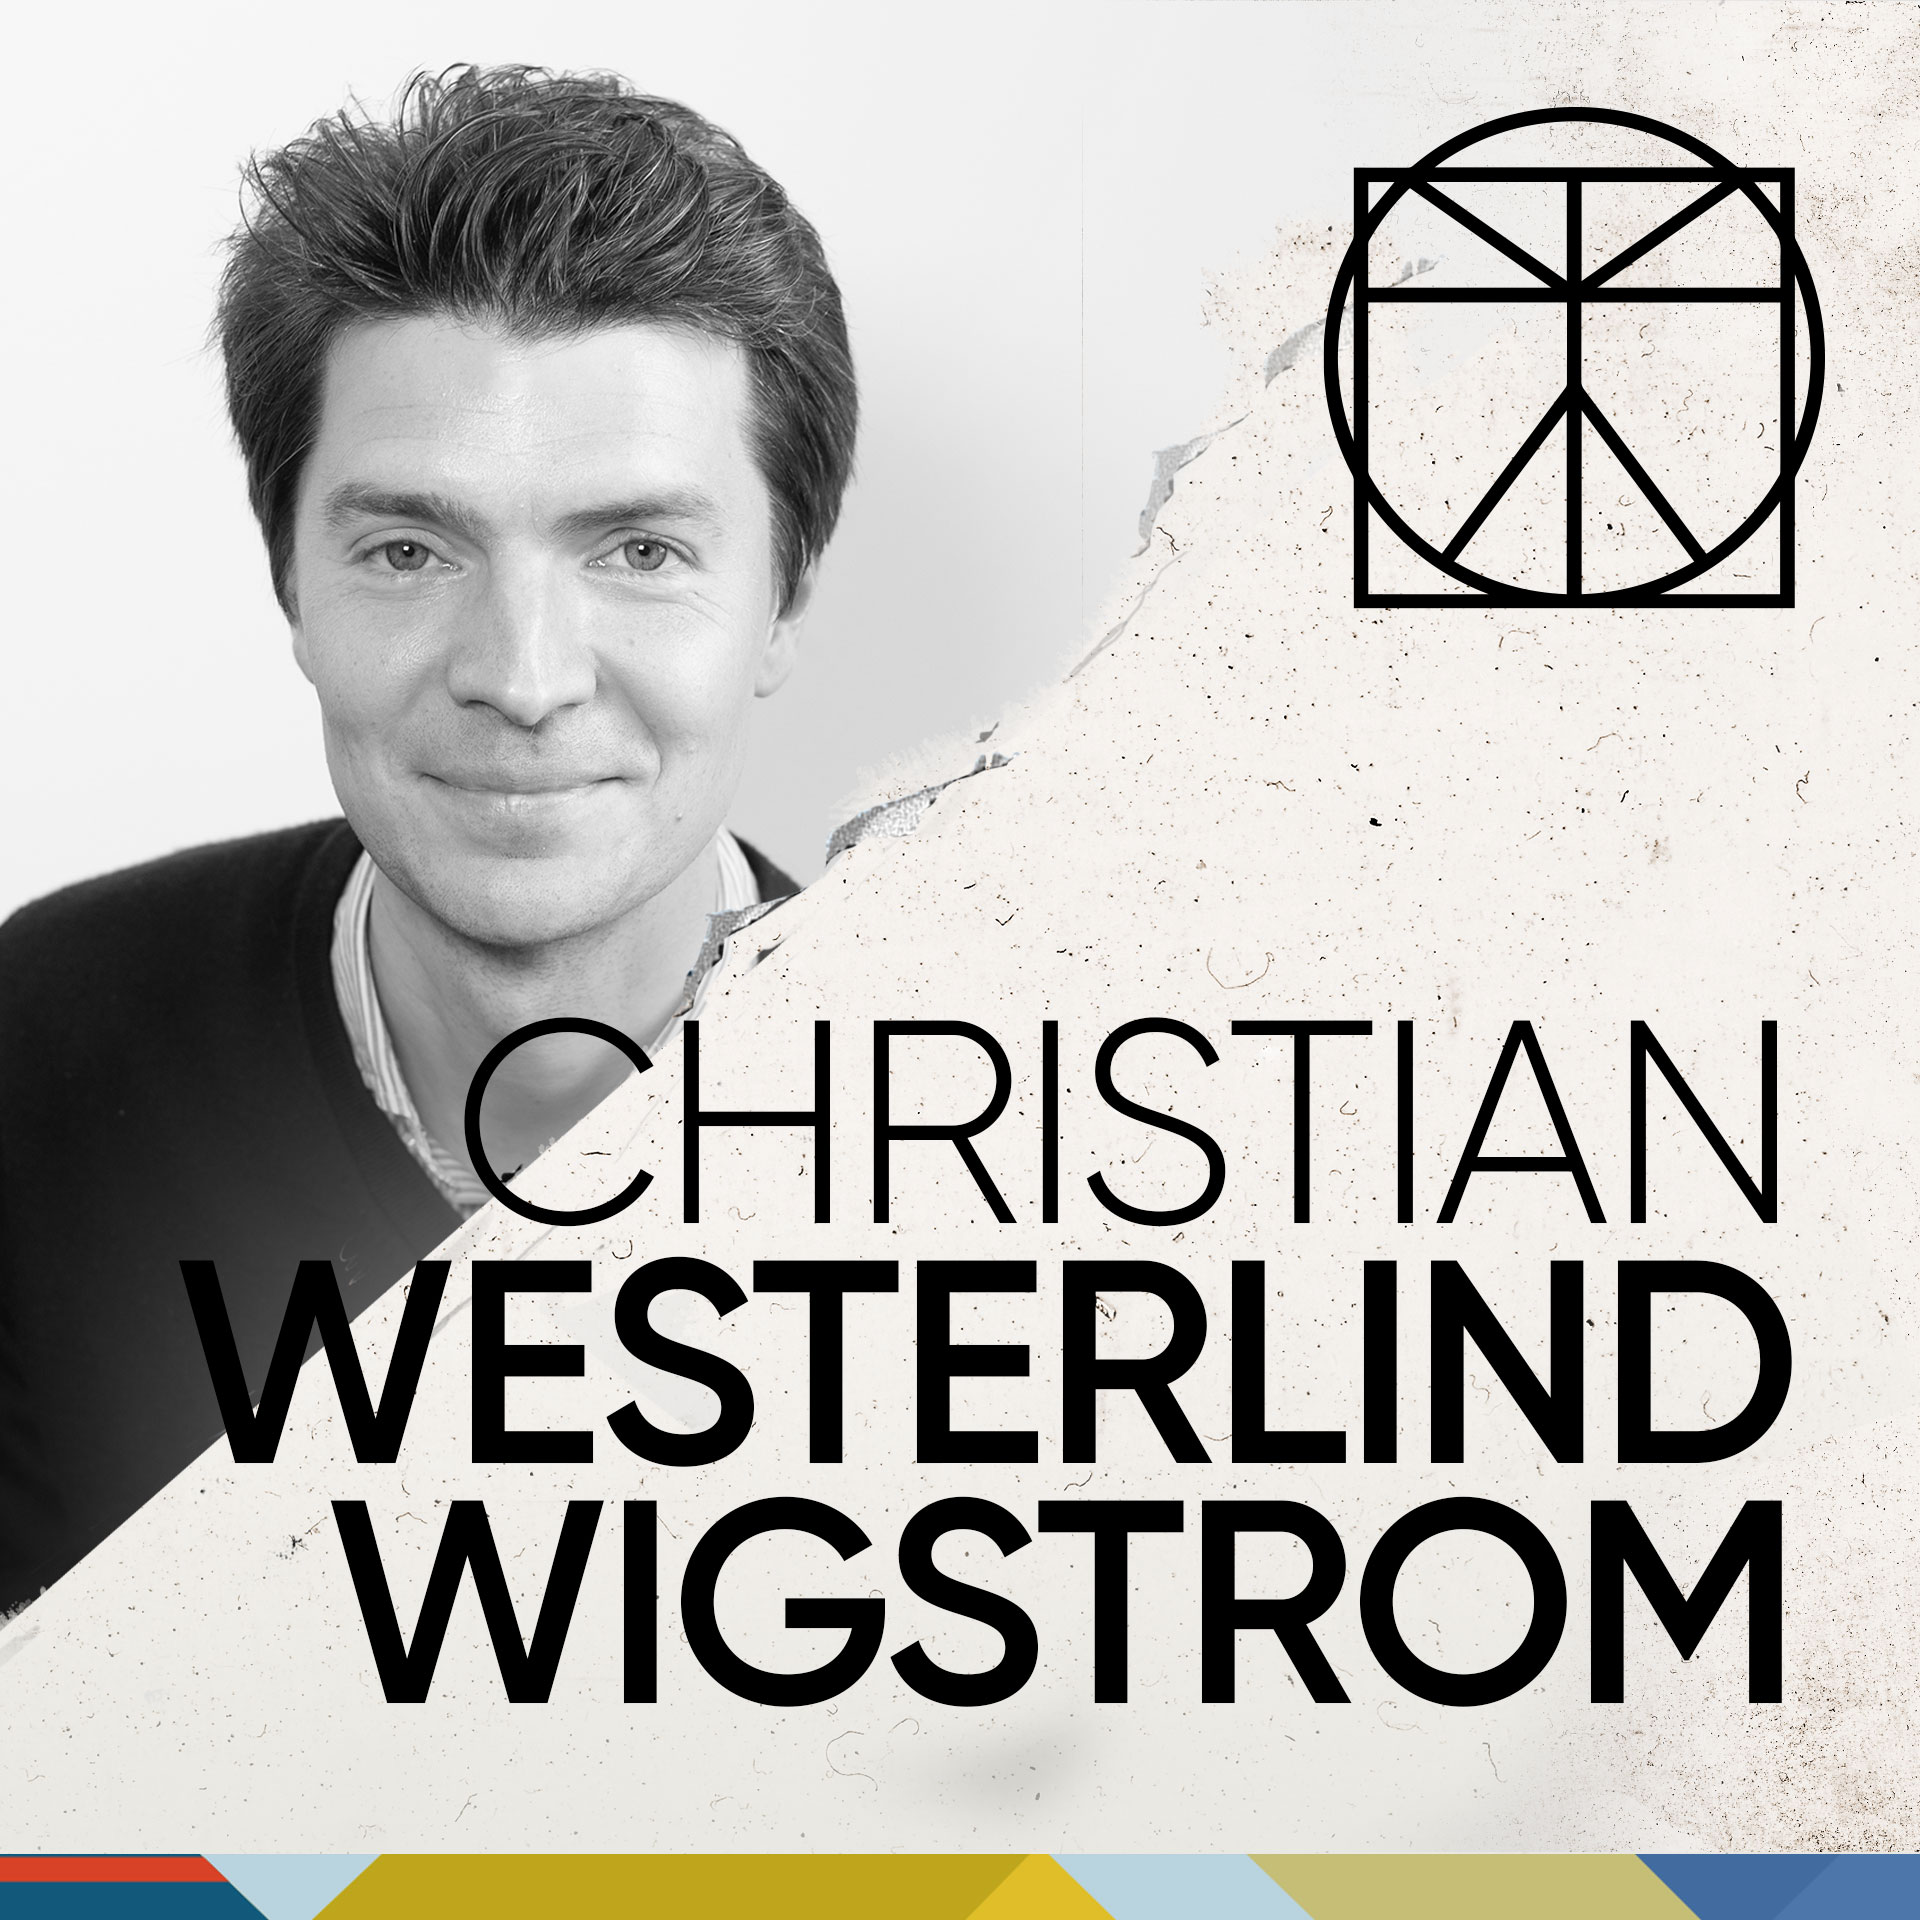 Christian Westerlind Wigström Futurist Anders Sörman-Nilsson